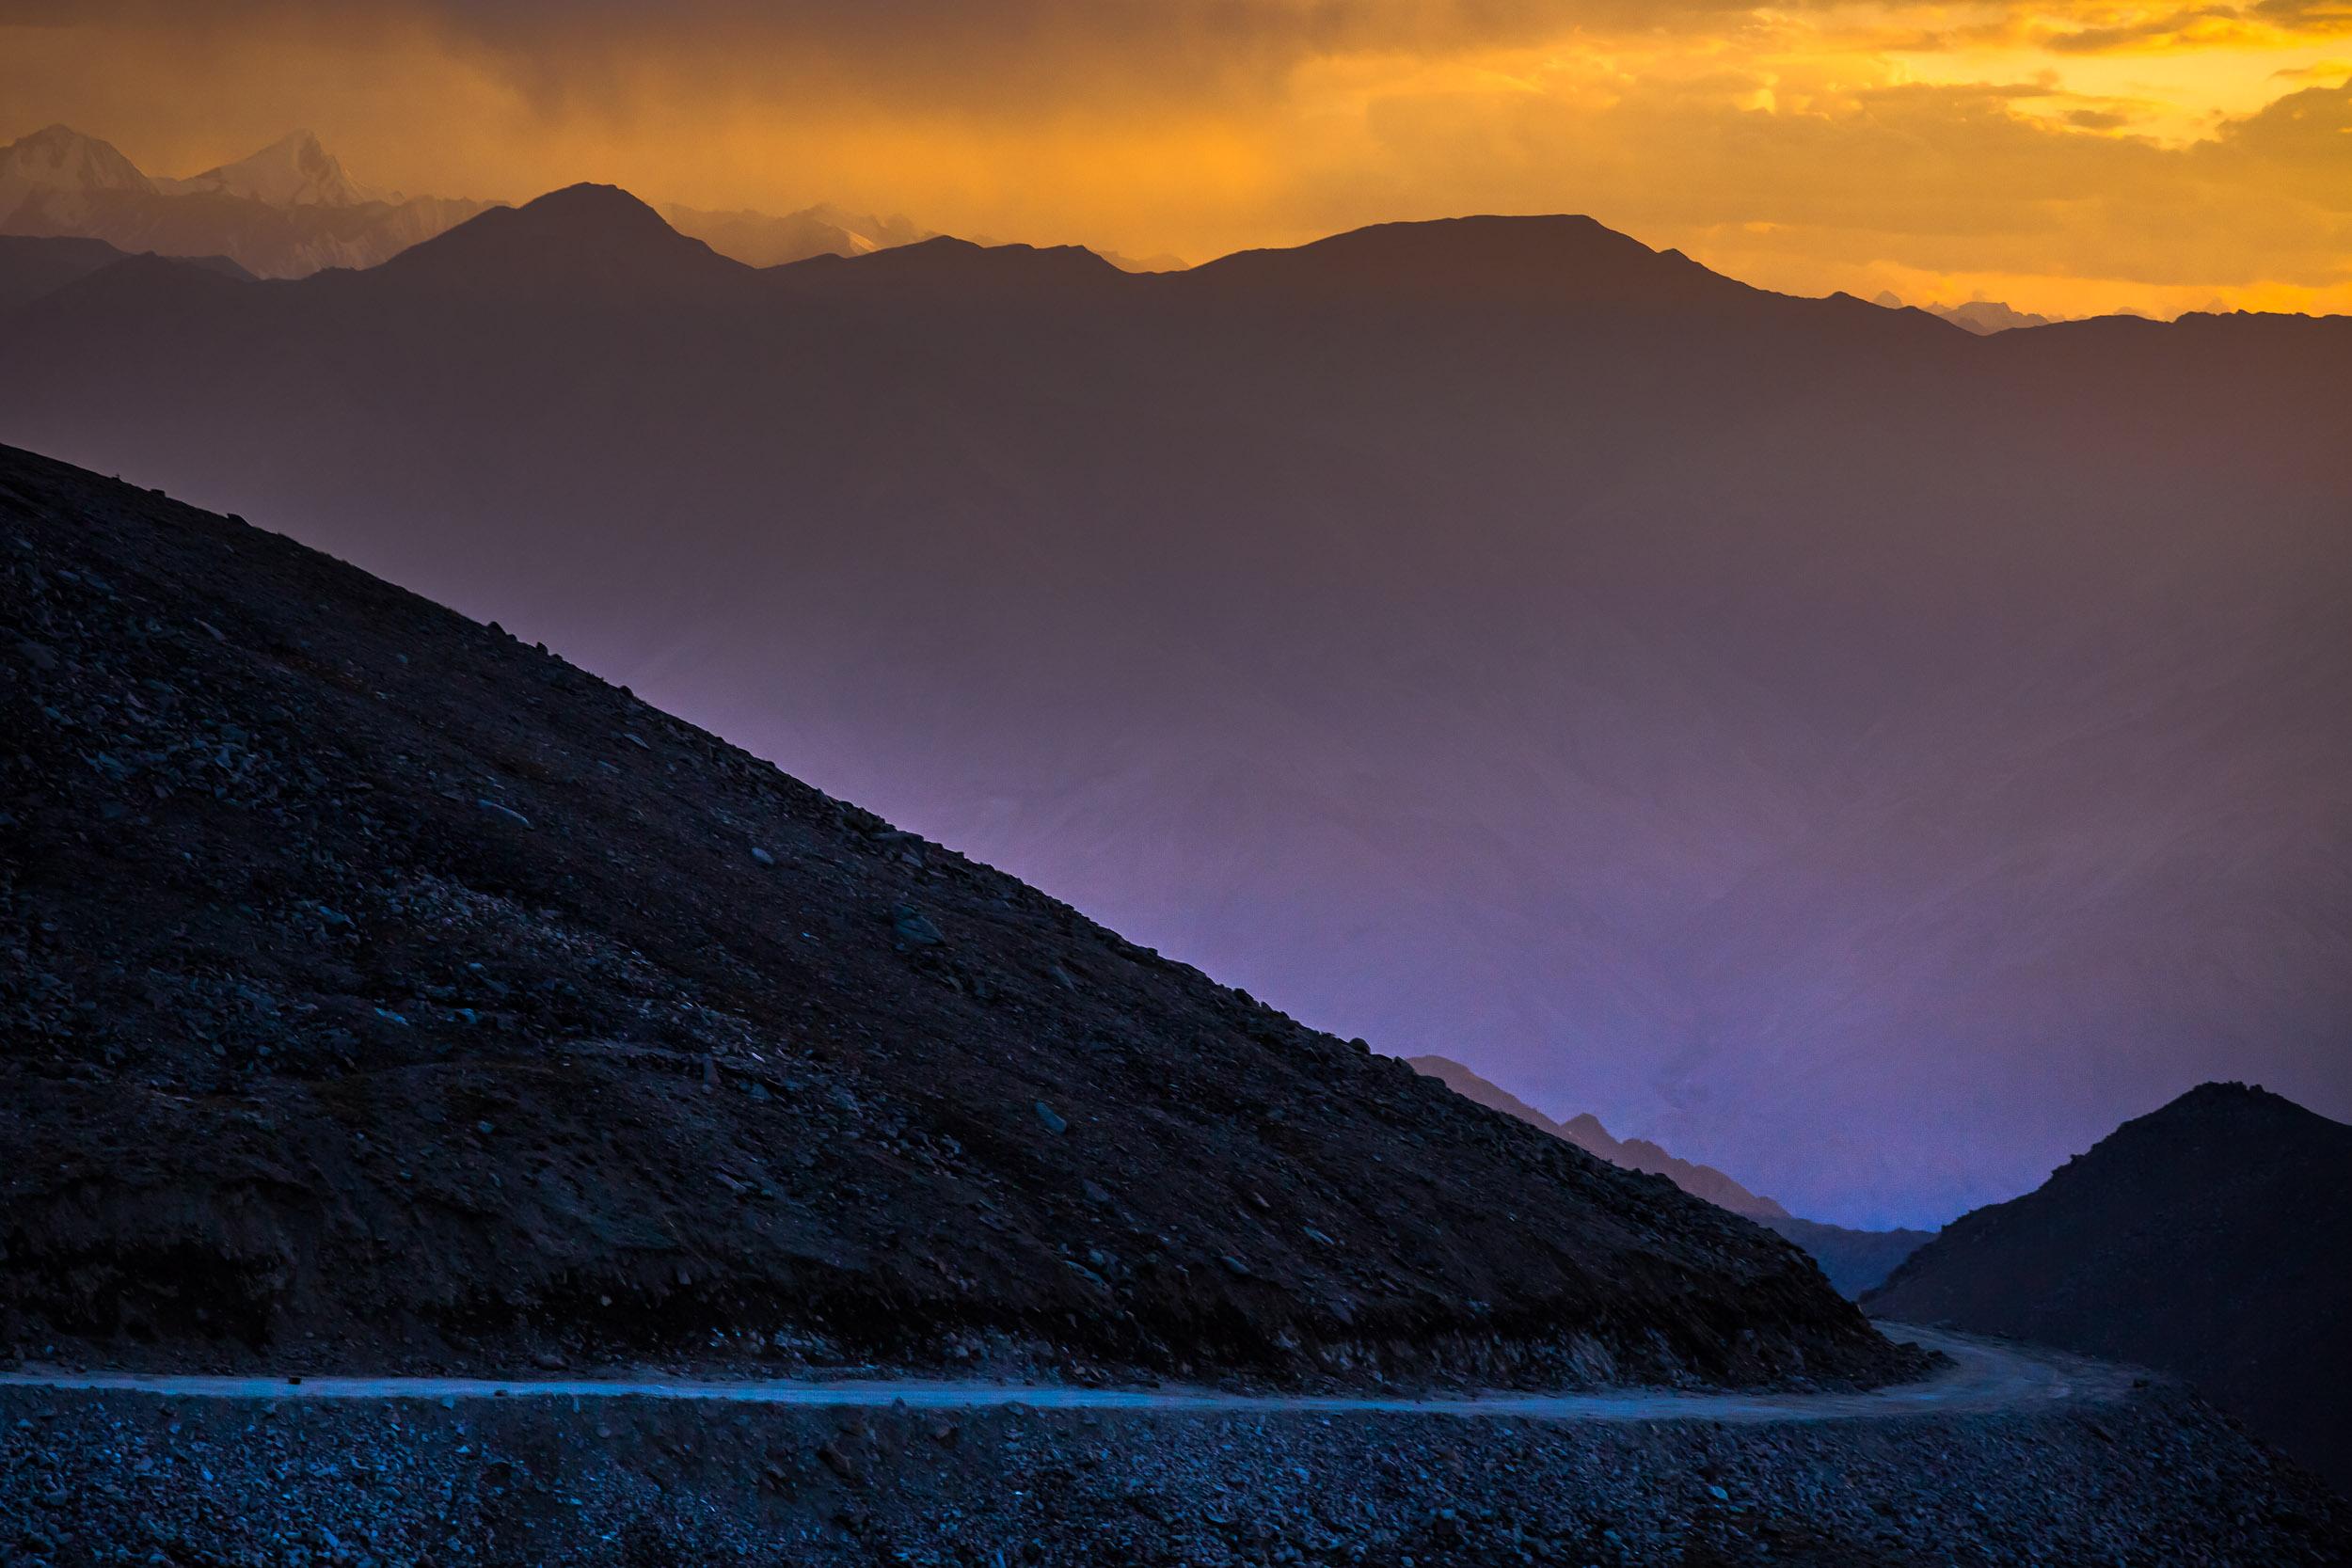 Sindhur_Photography_Travel_Landscape_Ladakh-17.JPG